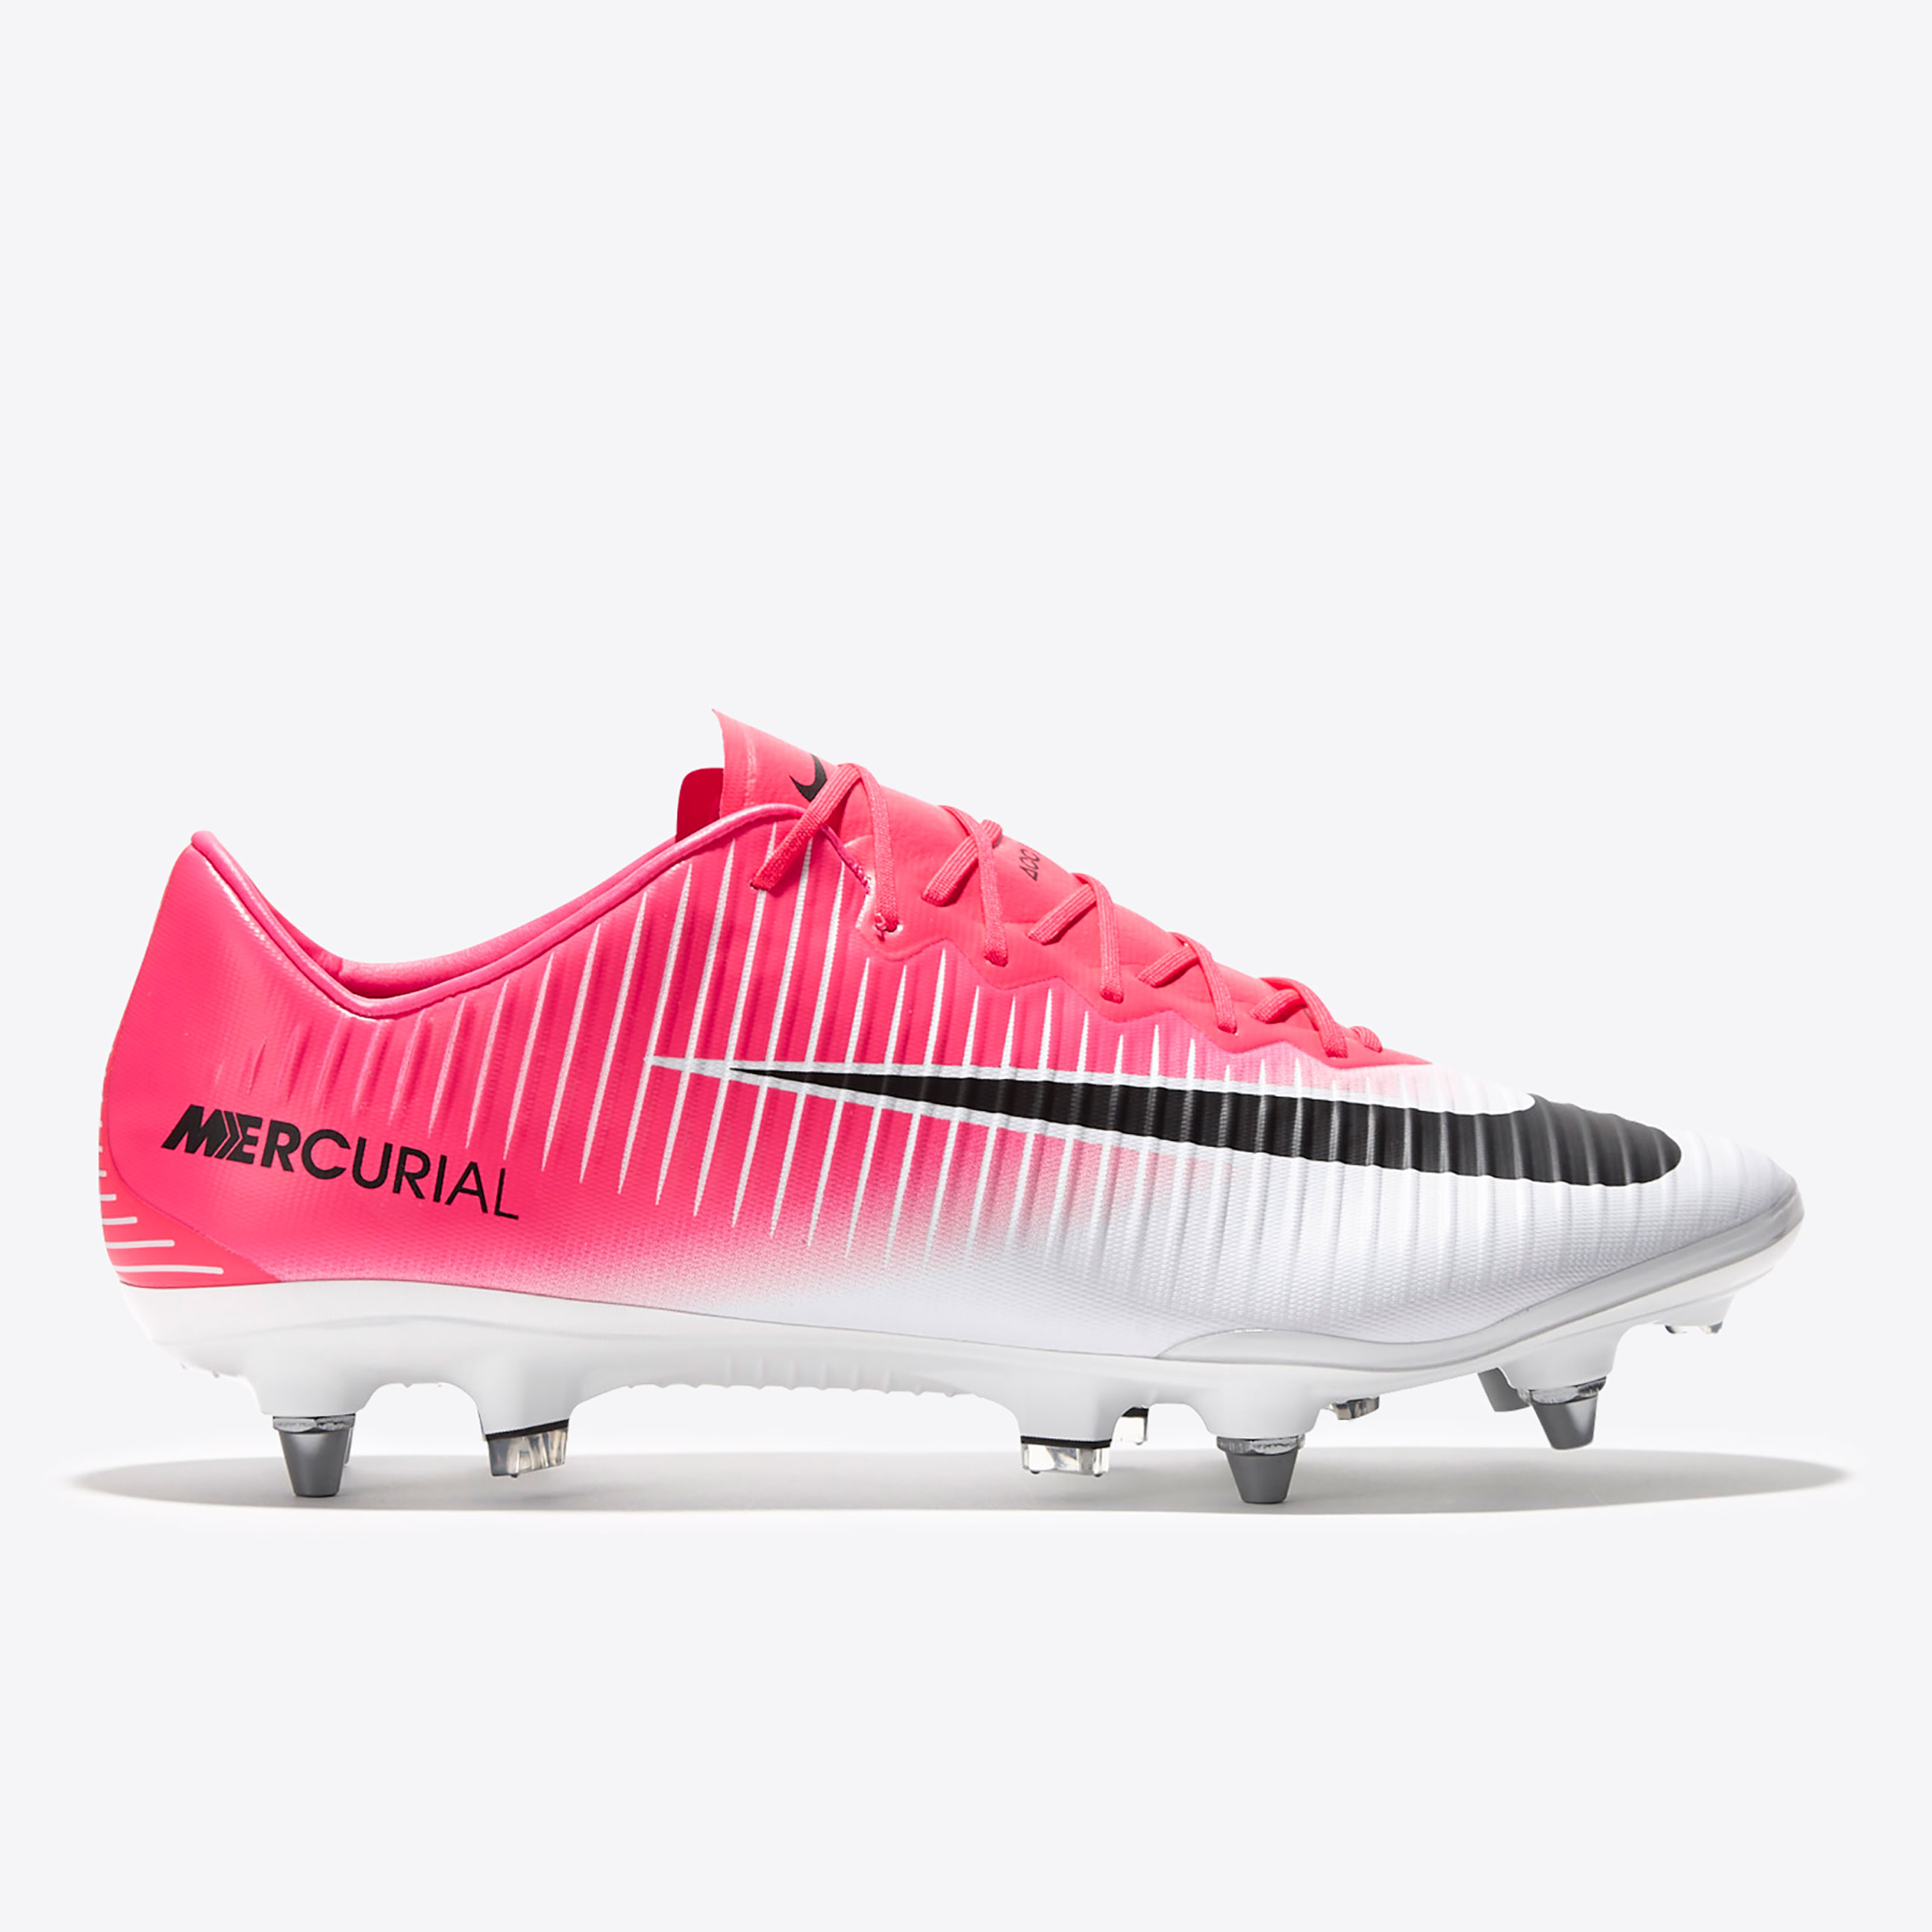 Nike Mercurial Vapor XI Soft Ground Pro Football Boots - Racer Pink/Bl